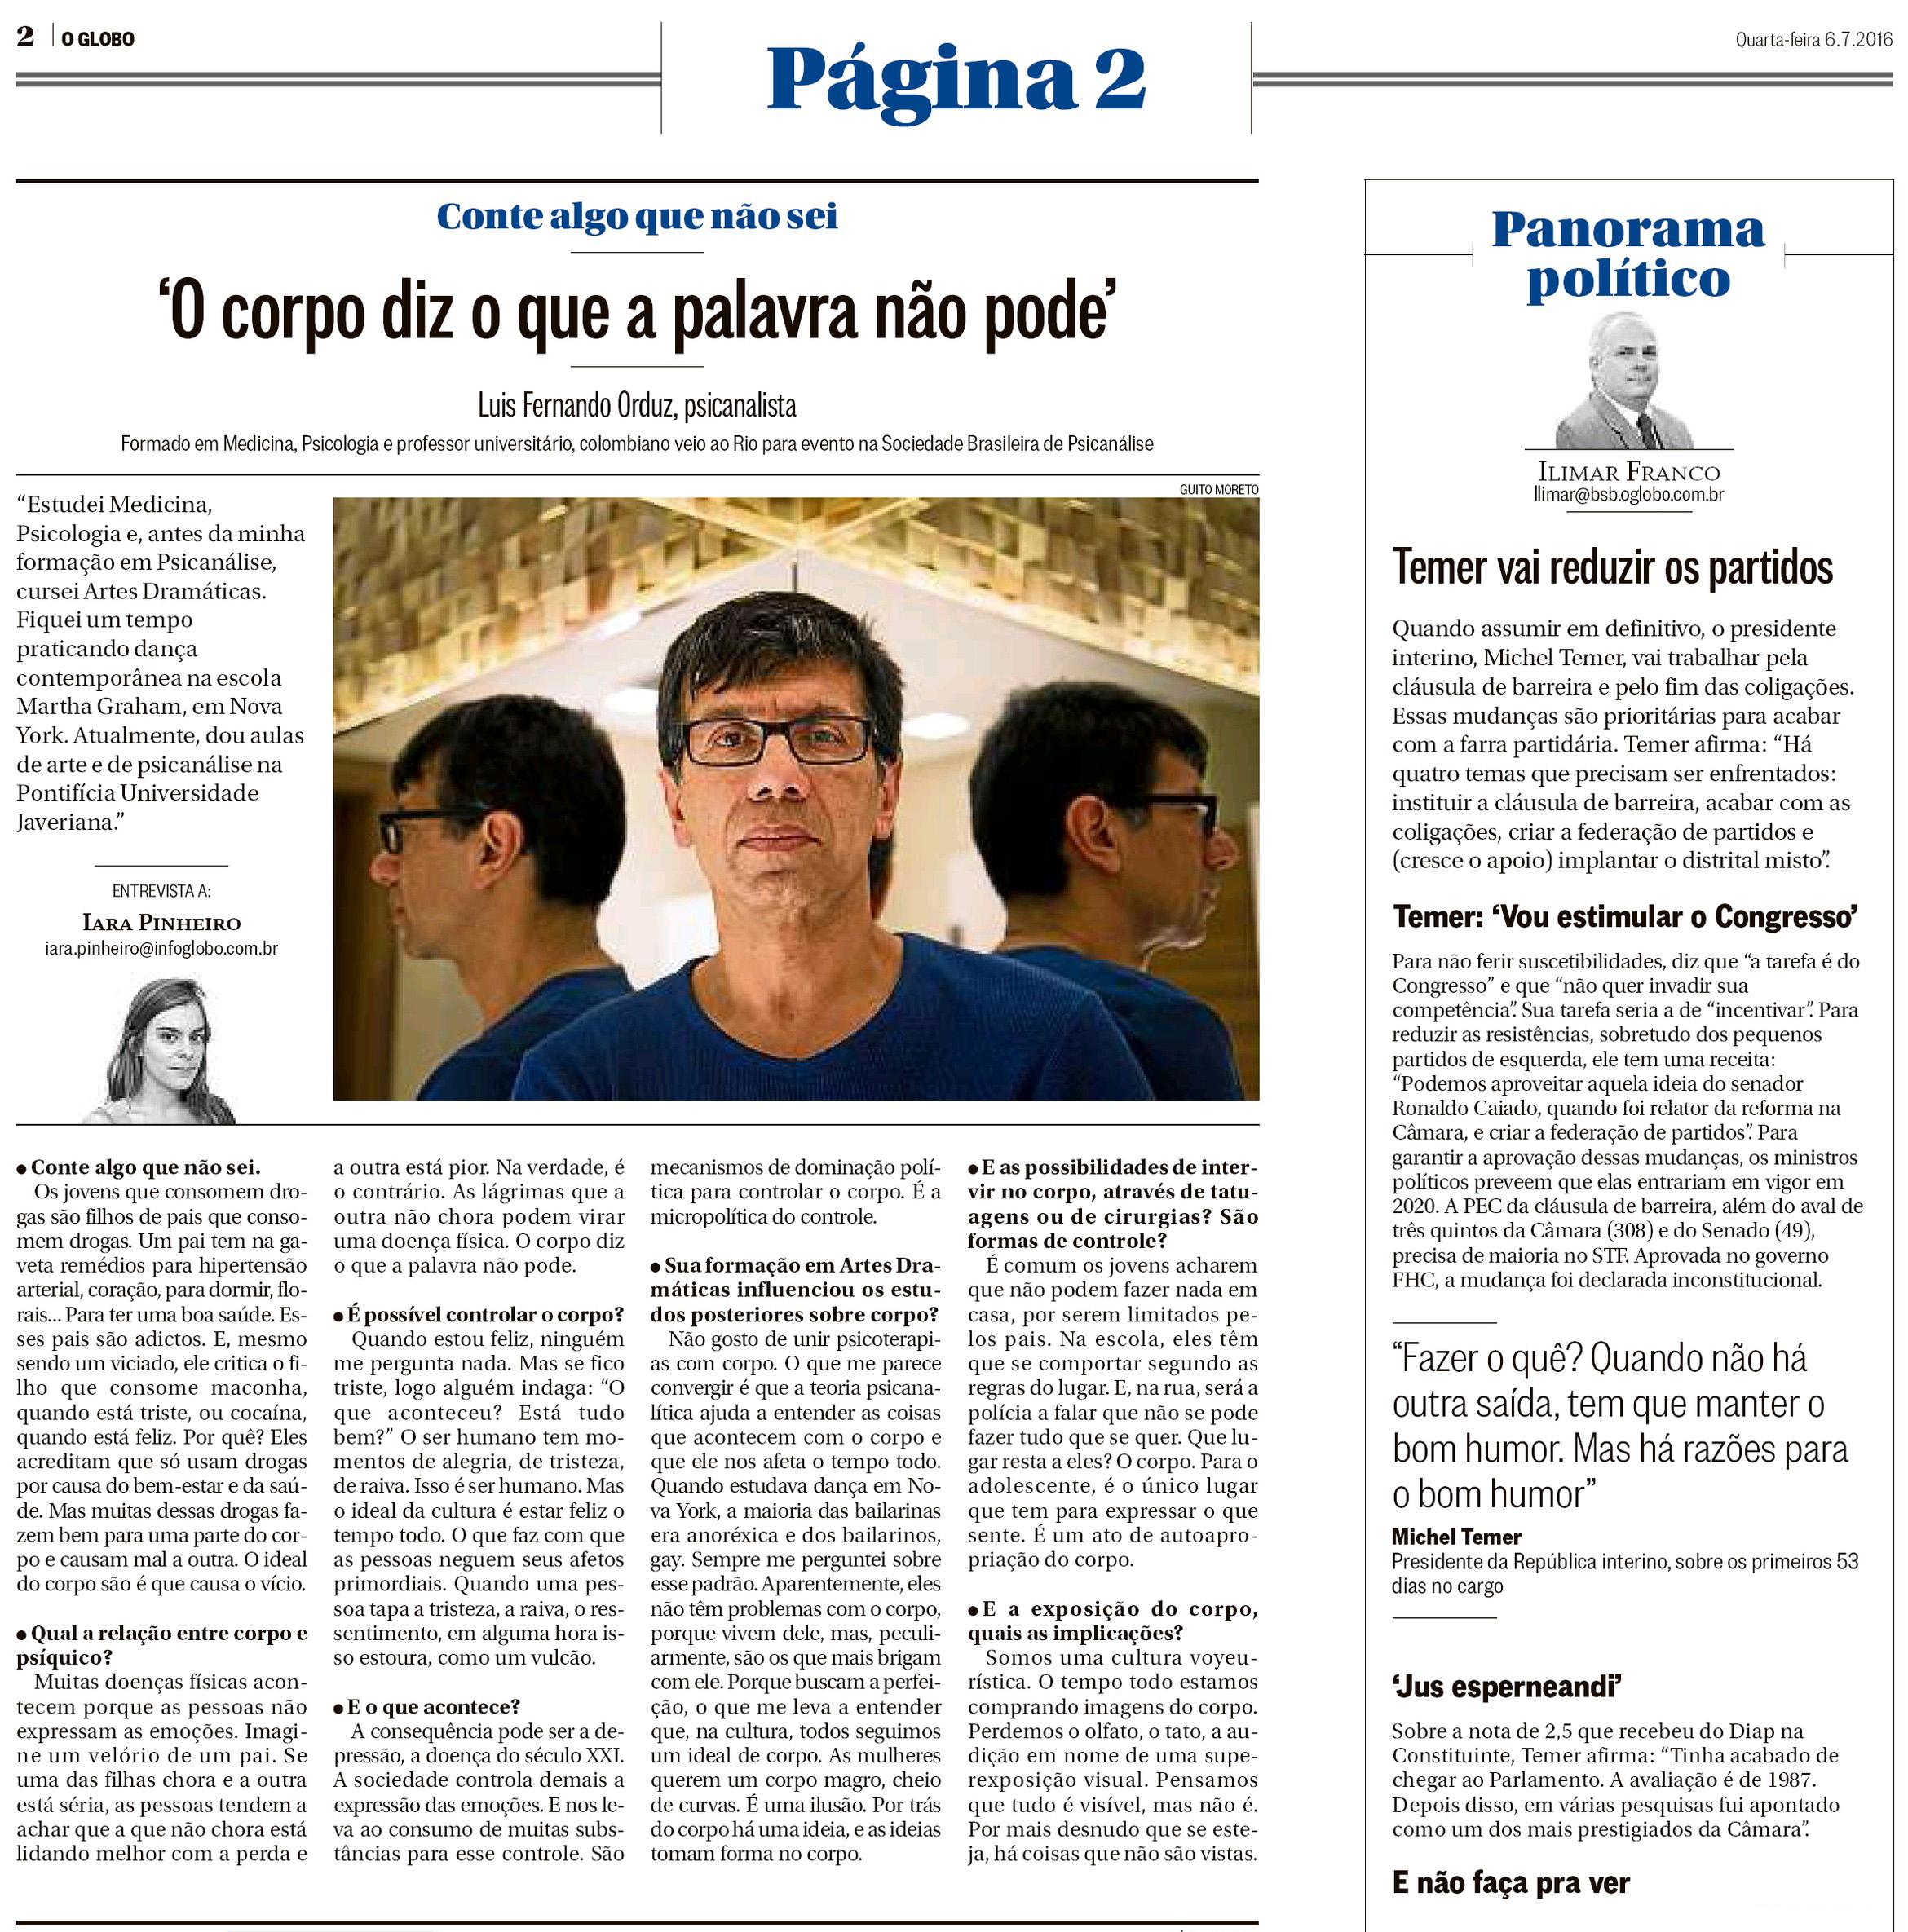 O Globo -  Página 2